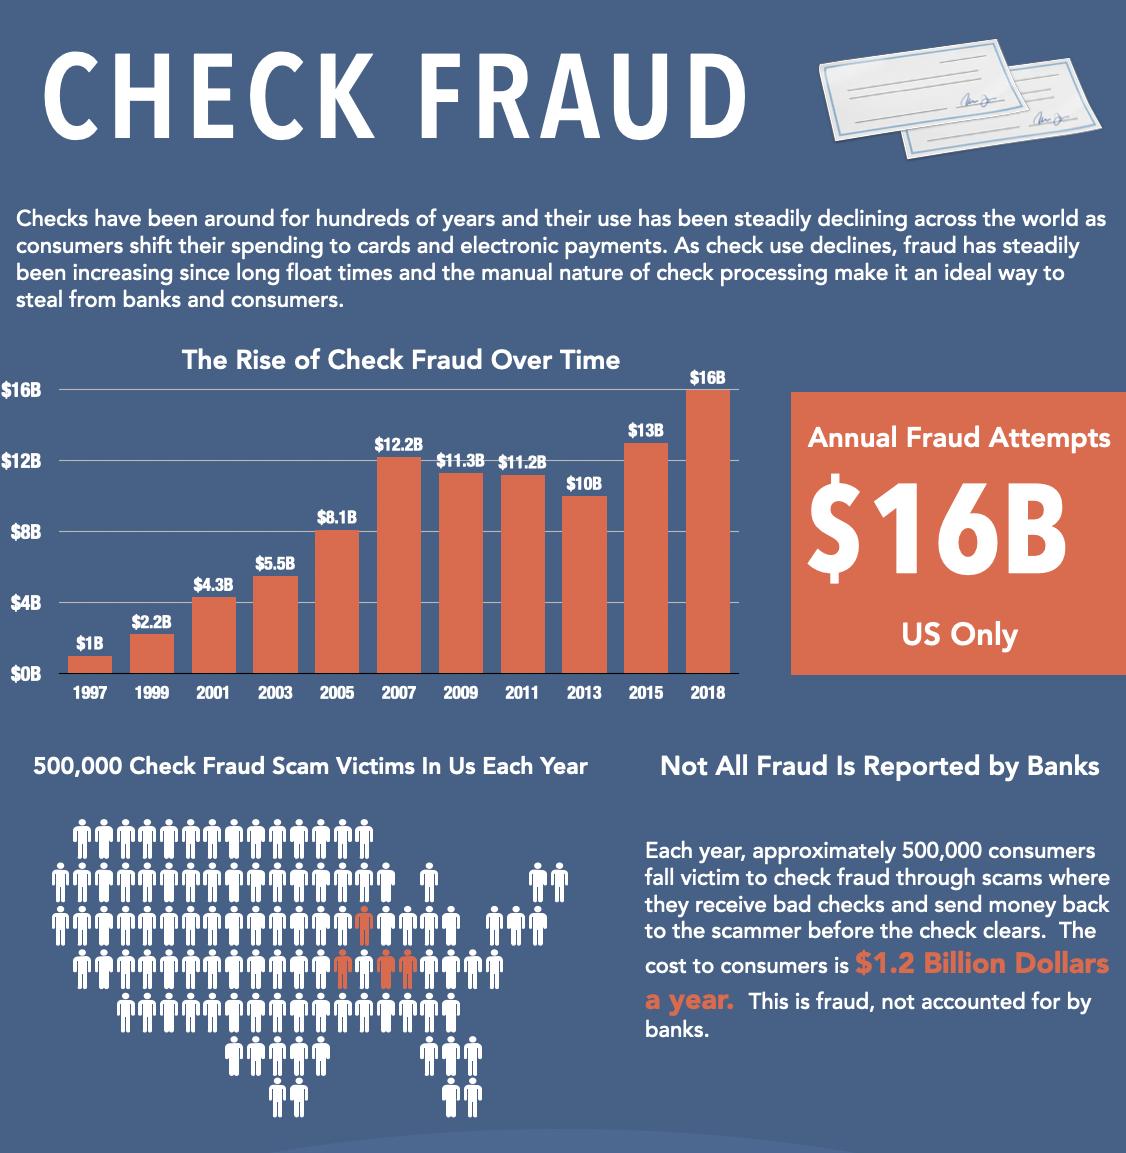 check-fraud-infographic-May-2020 v2